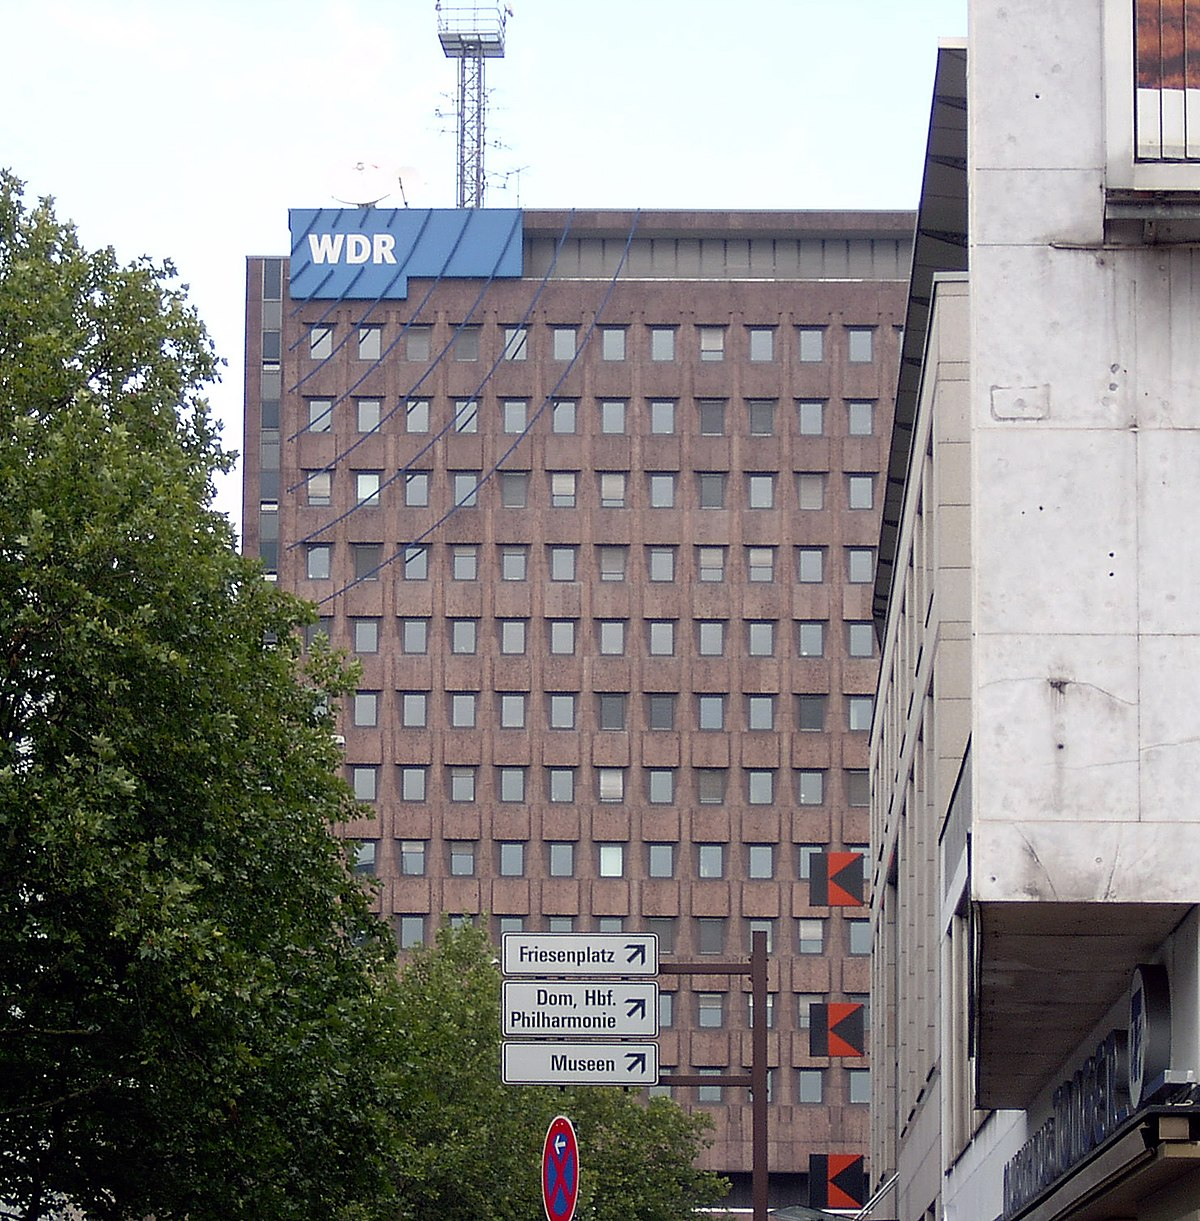 Köln Wdr